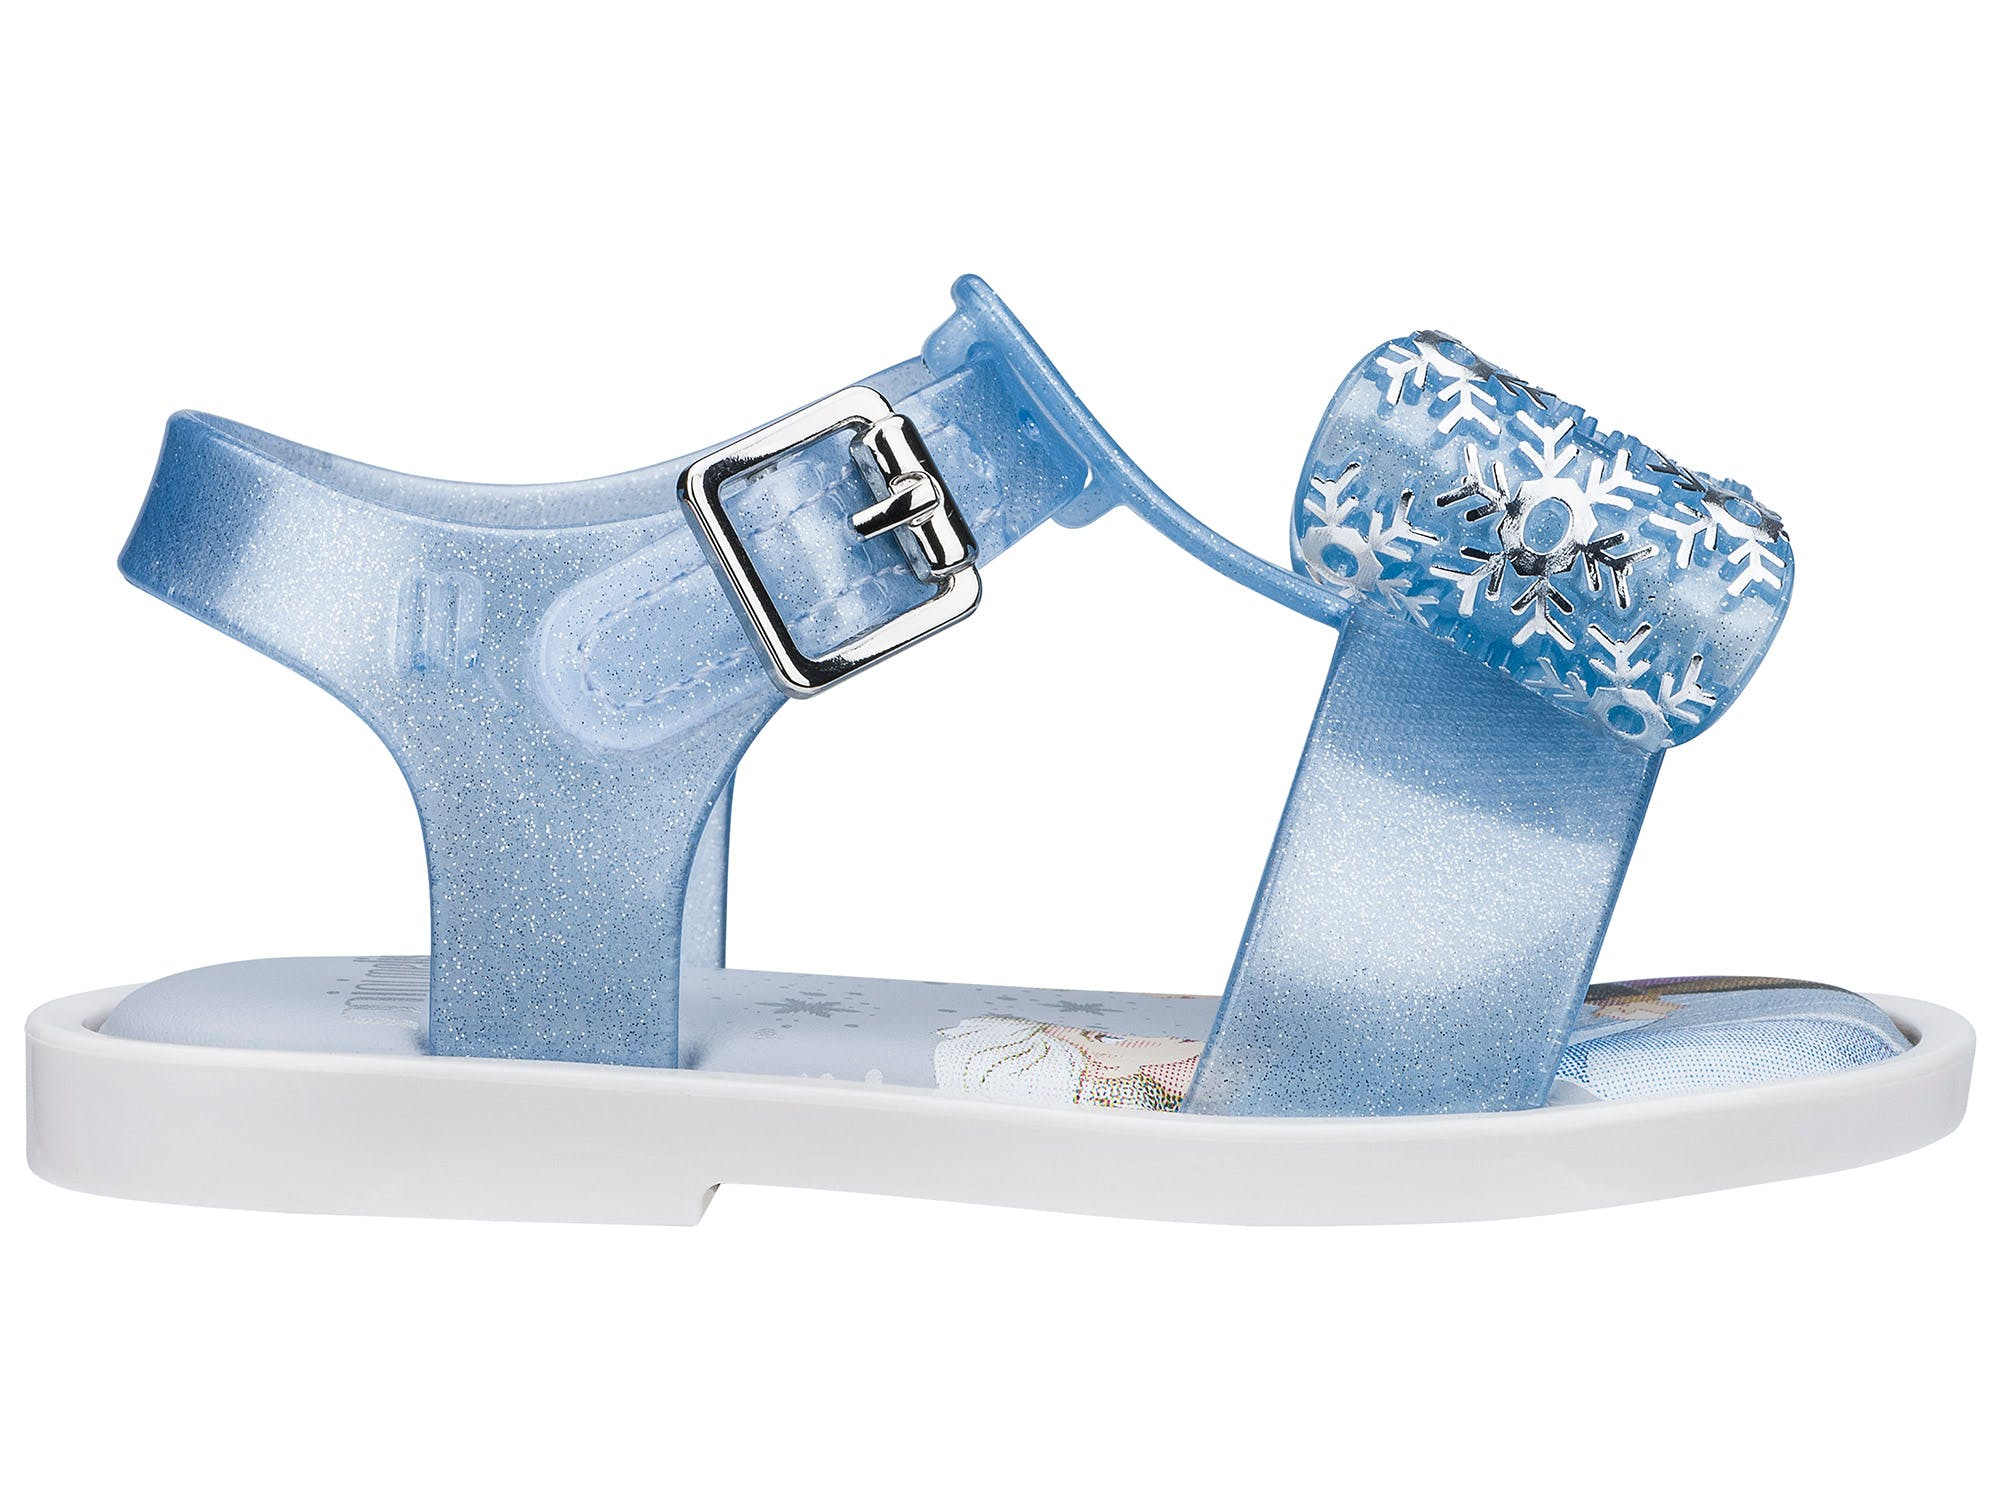 Mini Melissa Mar Sandal Frozen Branco/Azul Glitter Prata